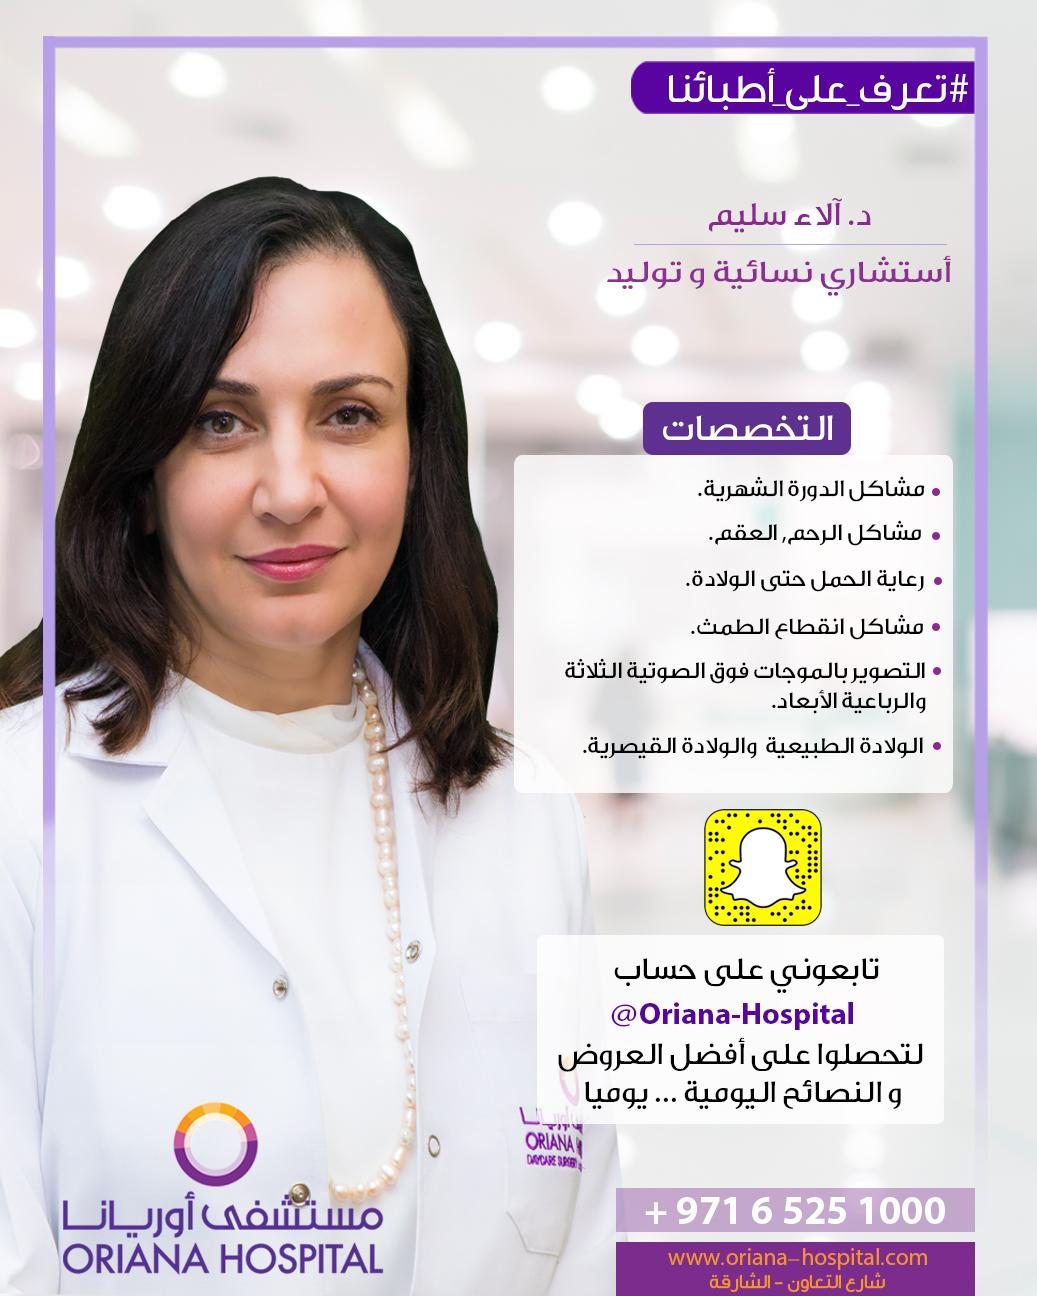 dr alaa arabic copy